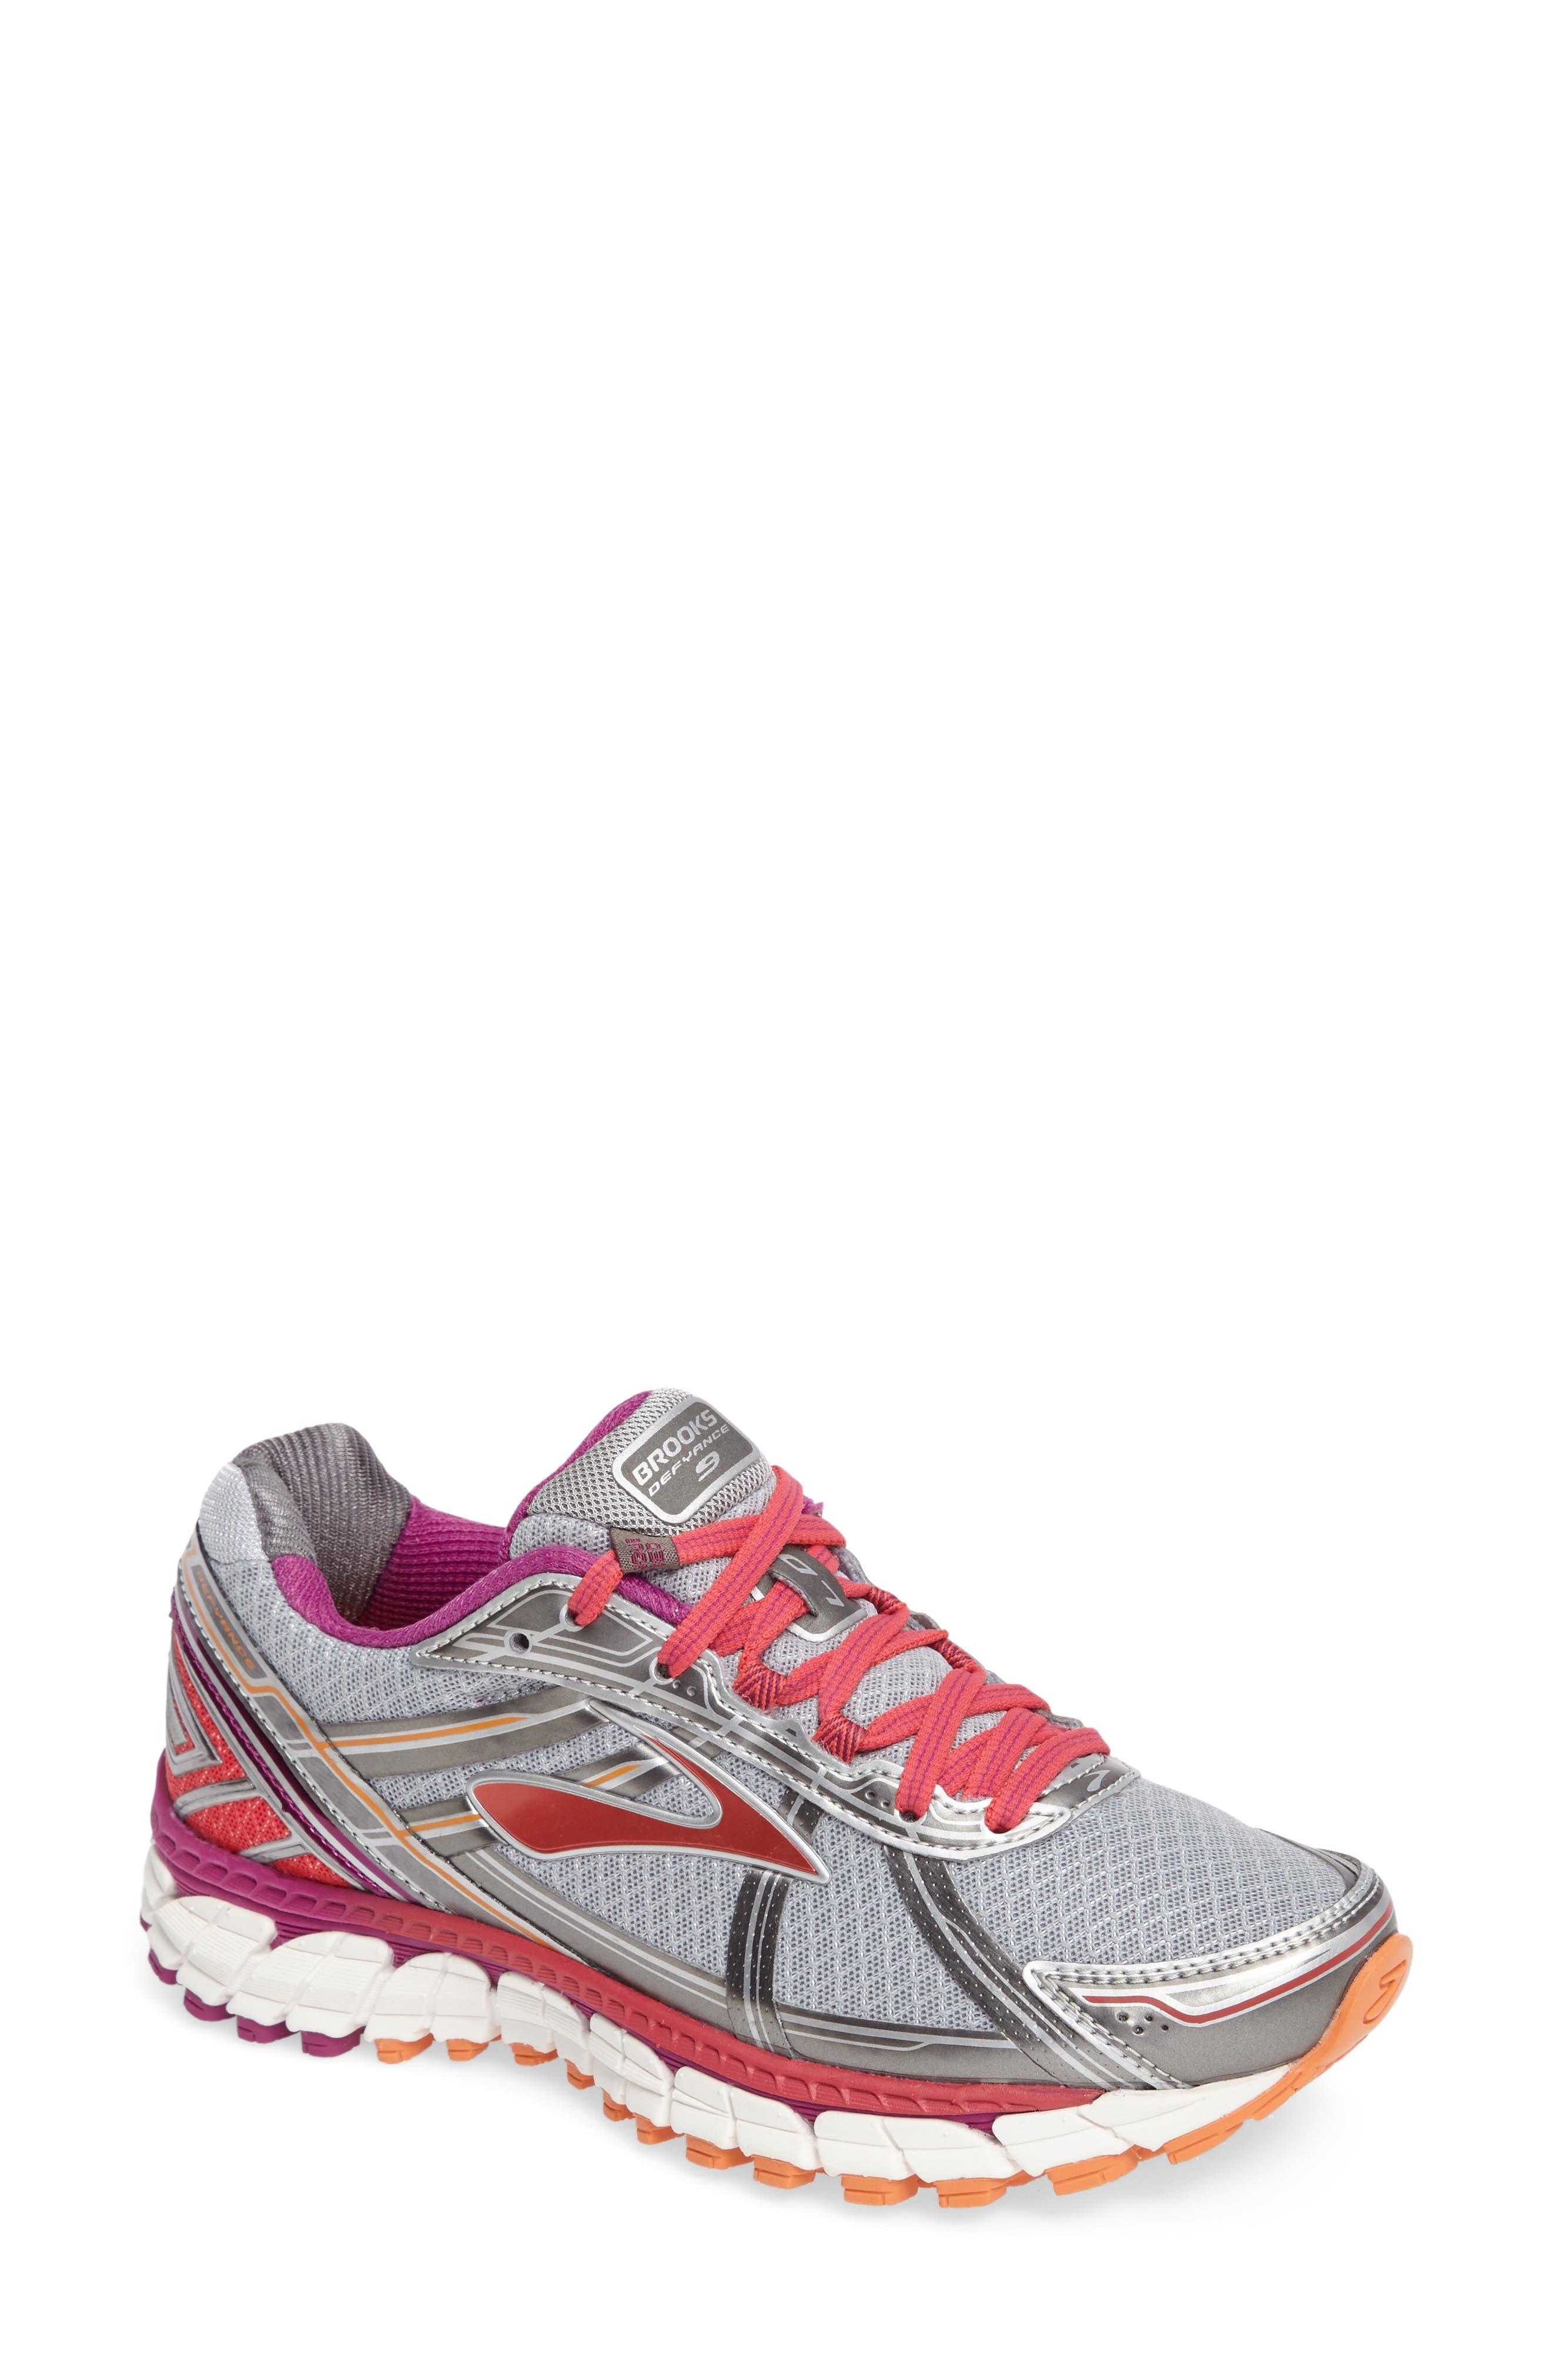 Brooks Womens Defyance 9 Running Shoes Women Shoes